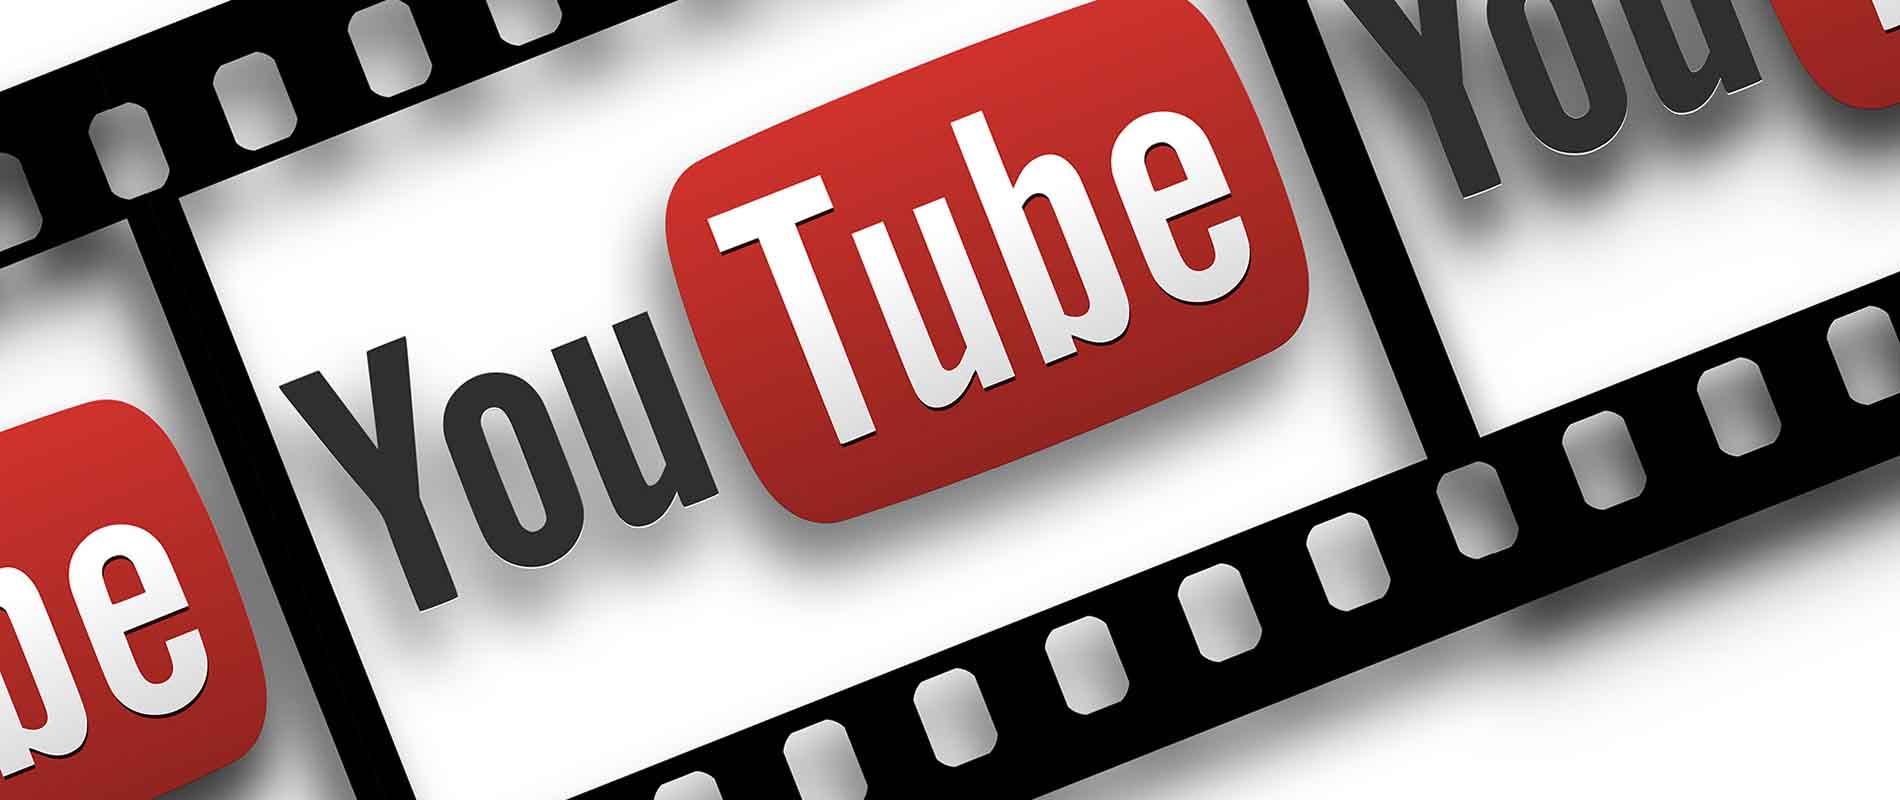 Youtube Kanal Melters und Partner